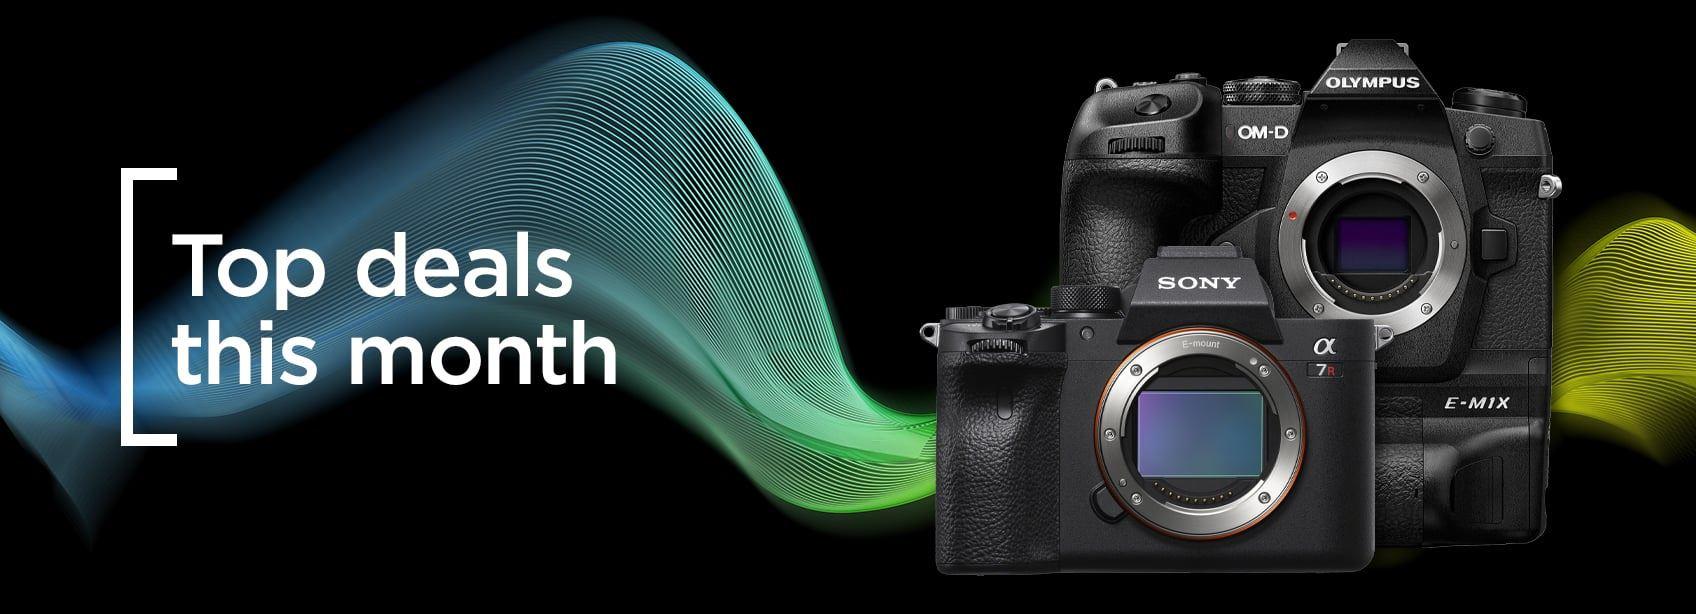 Wex Photo Video | Digital Cameras, DSLRs, Lenses, Video